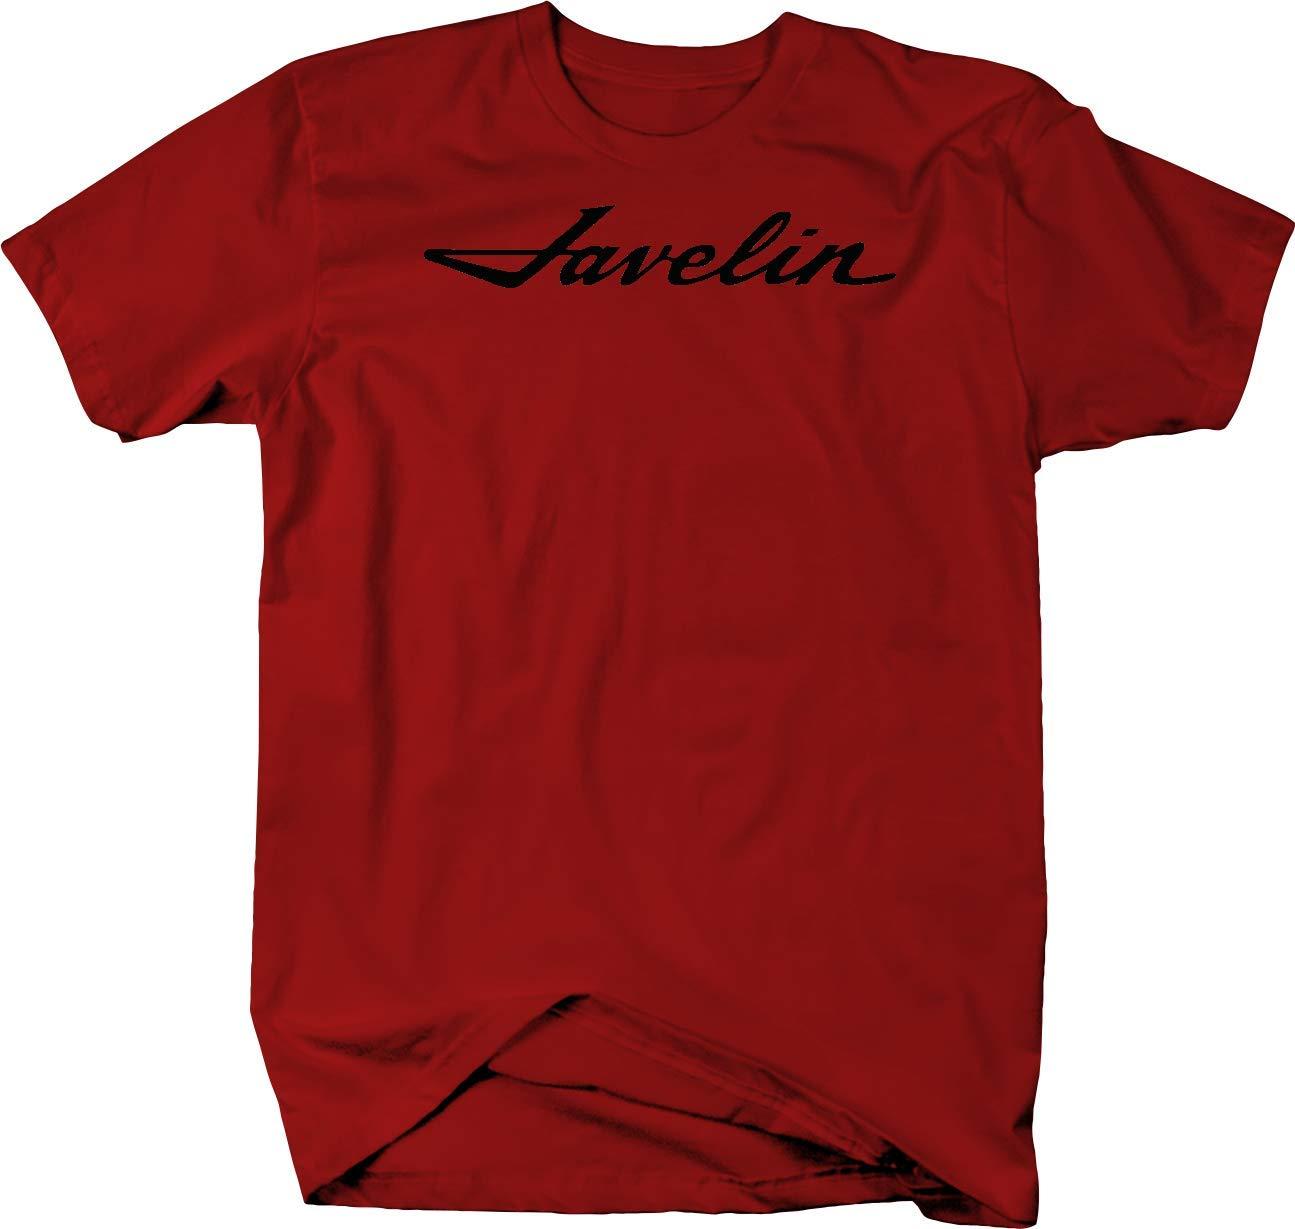 Amc Amx Javelin Emblem Logo Color Tshirt